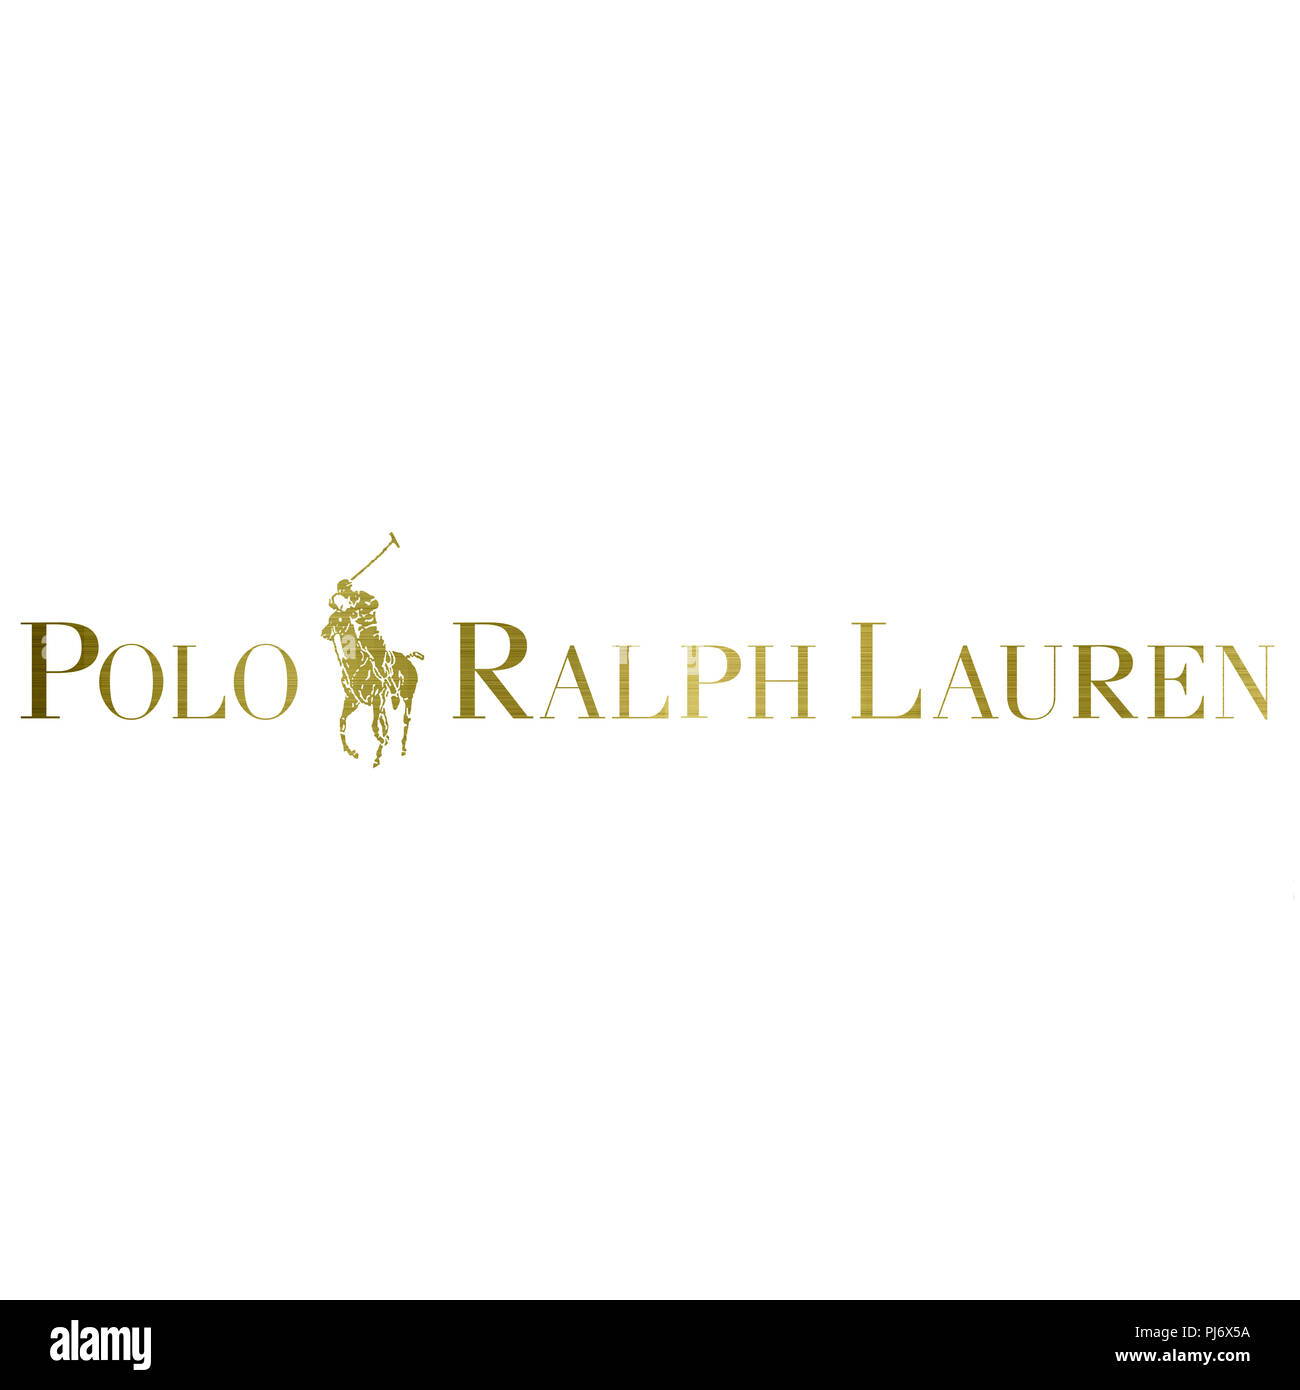 premium selection 19703 7b7f6 polo ralph lauren logo golden metallic fashion luxury brand ...